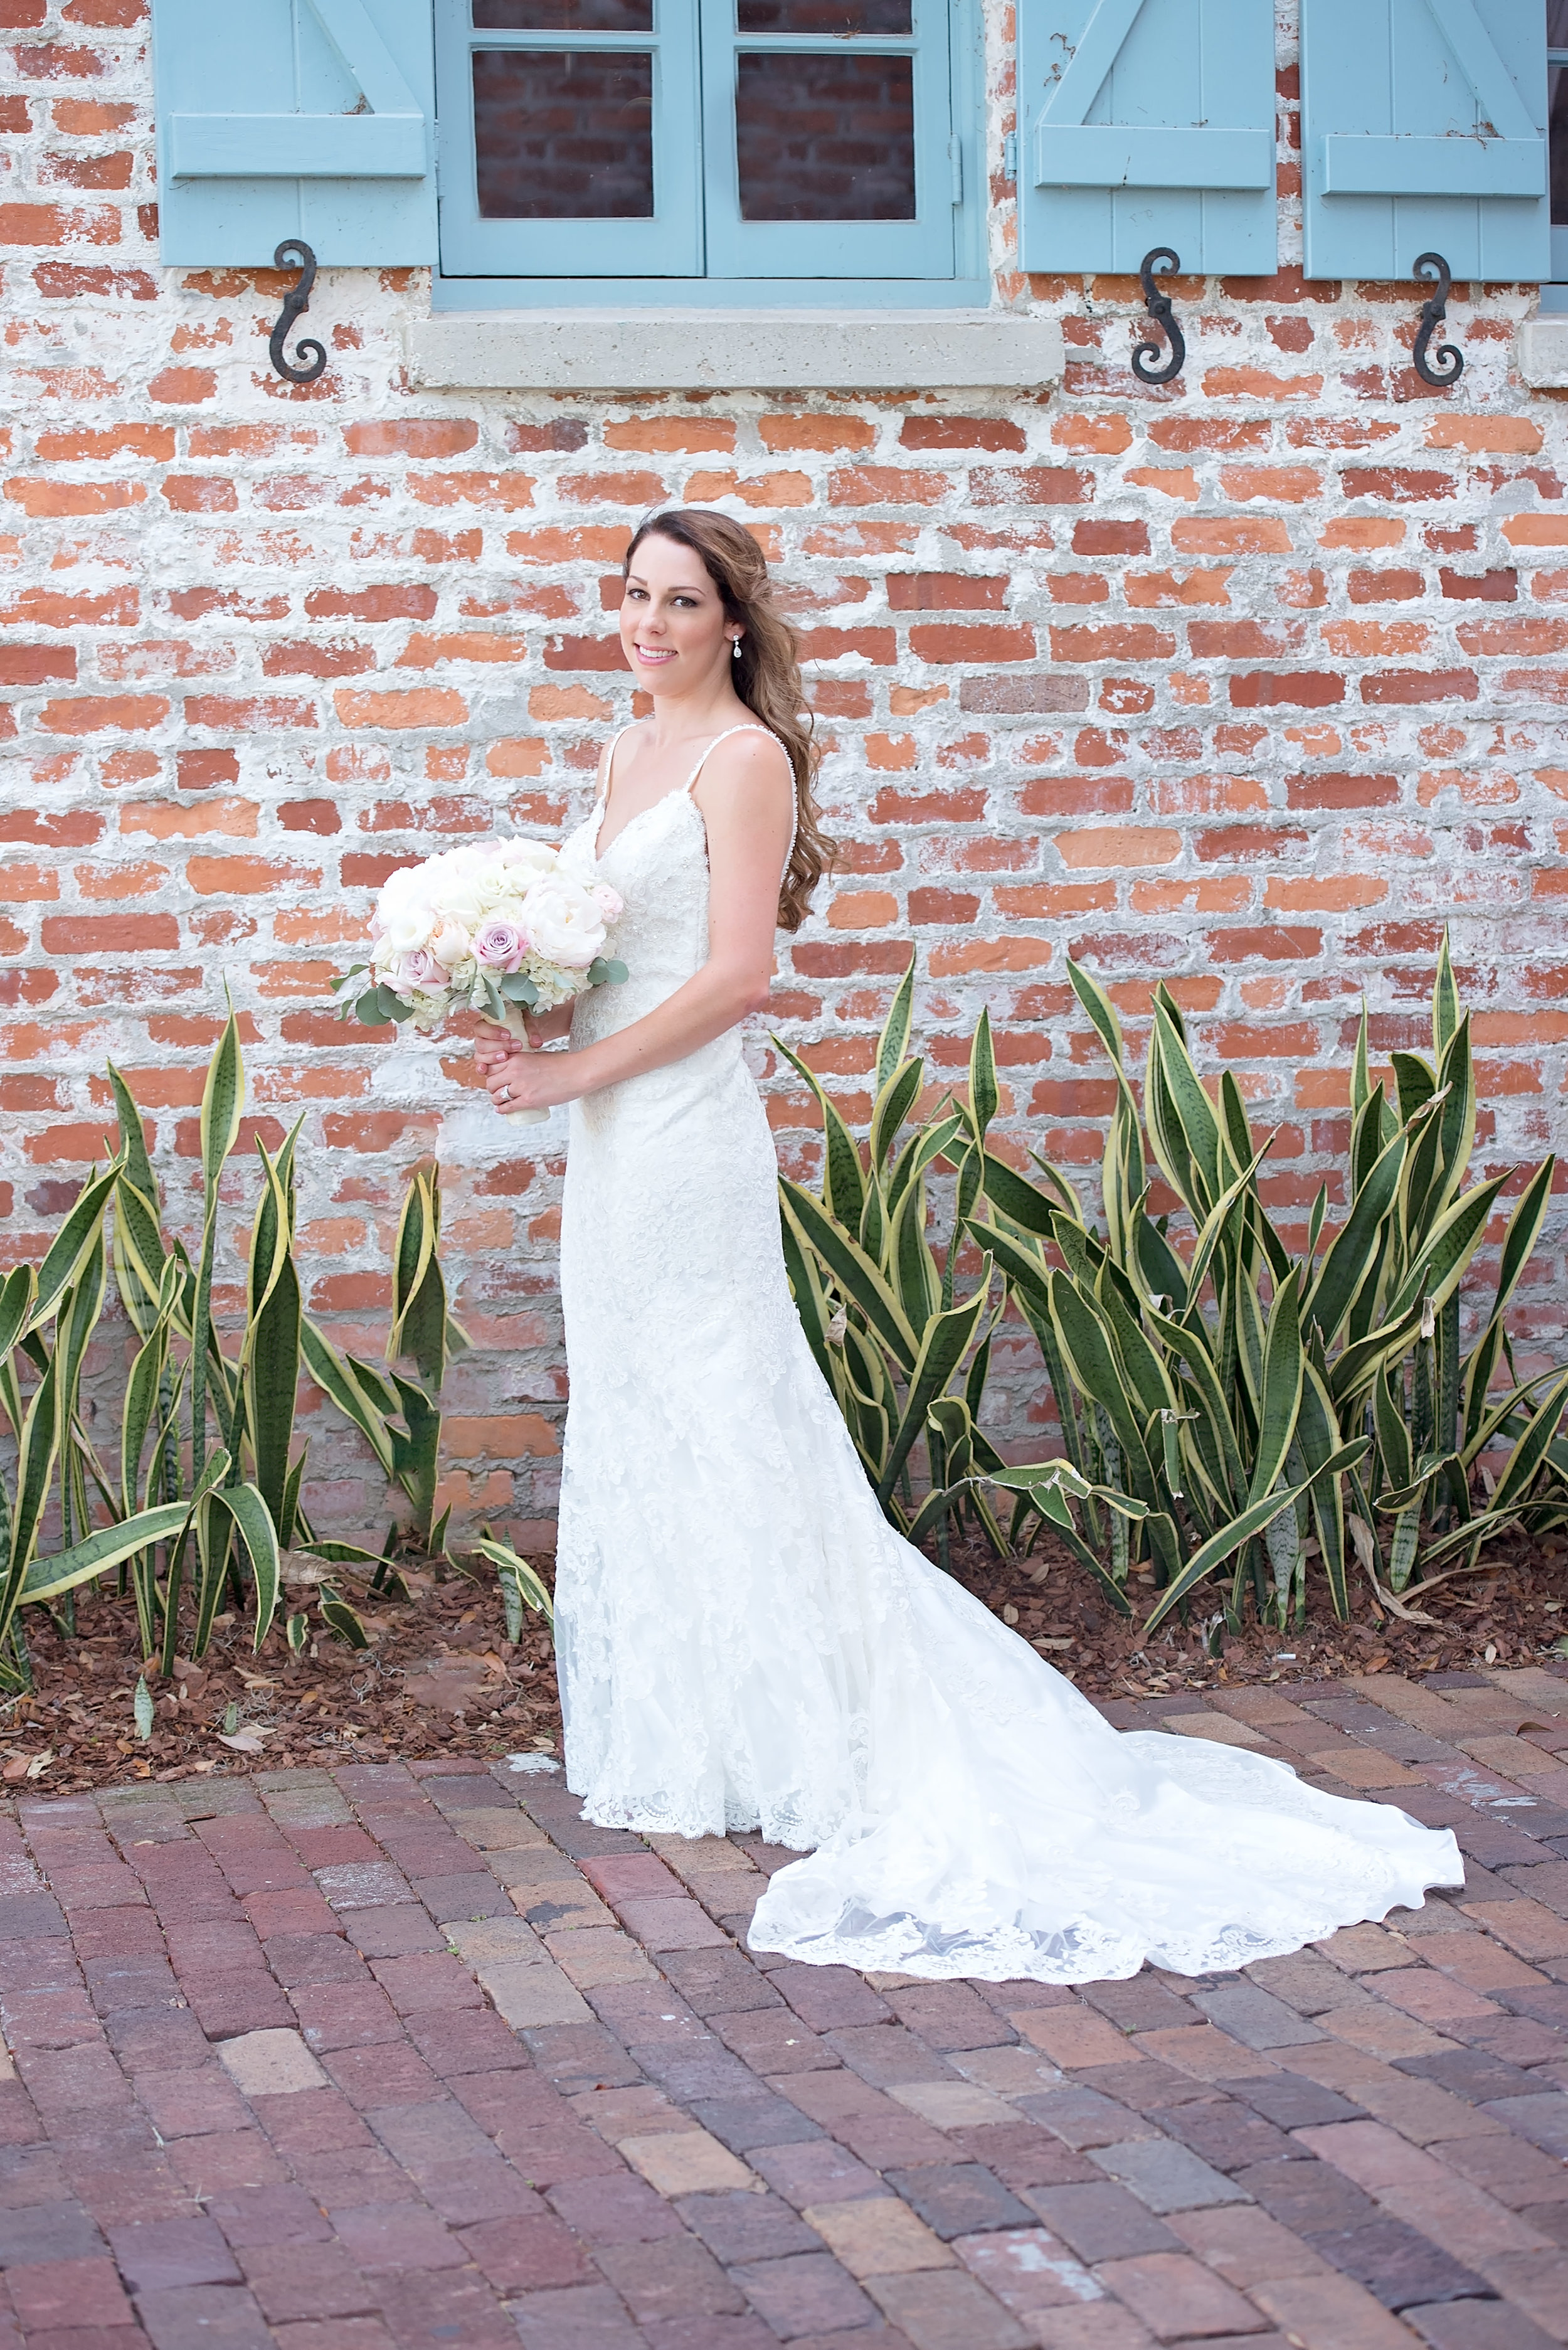 Blush and White Wedding Bouquet - Blush and White Wedding - Los Feliz Wedding